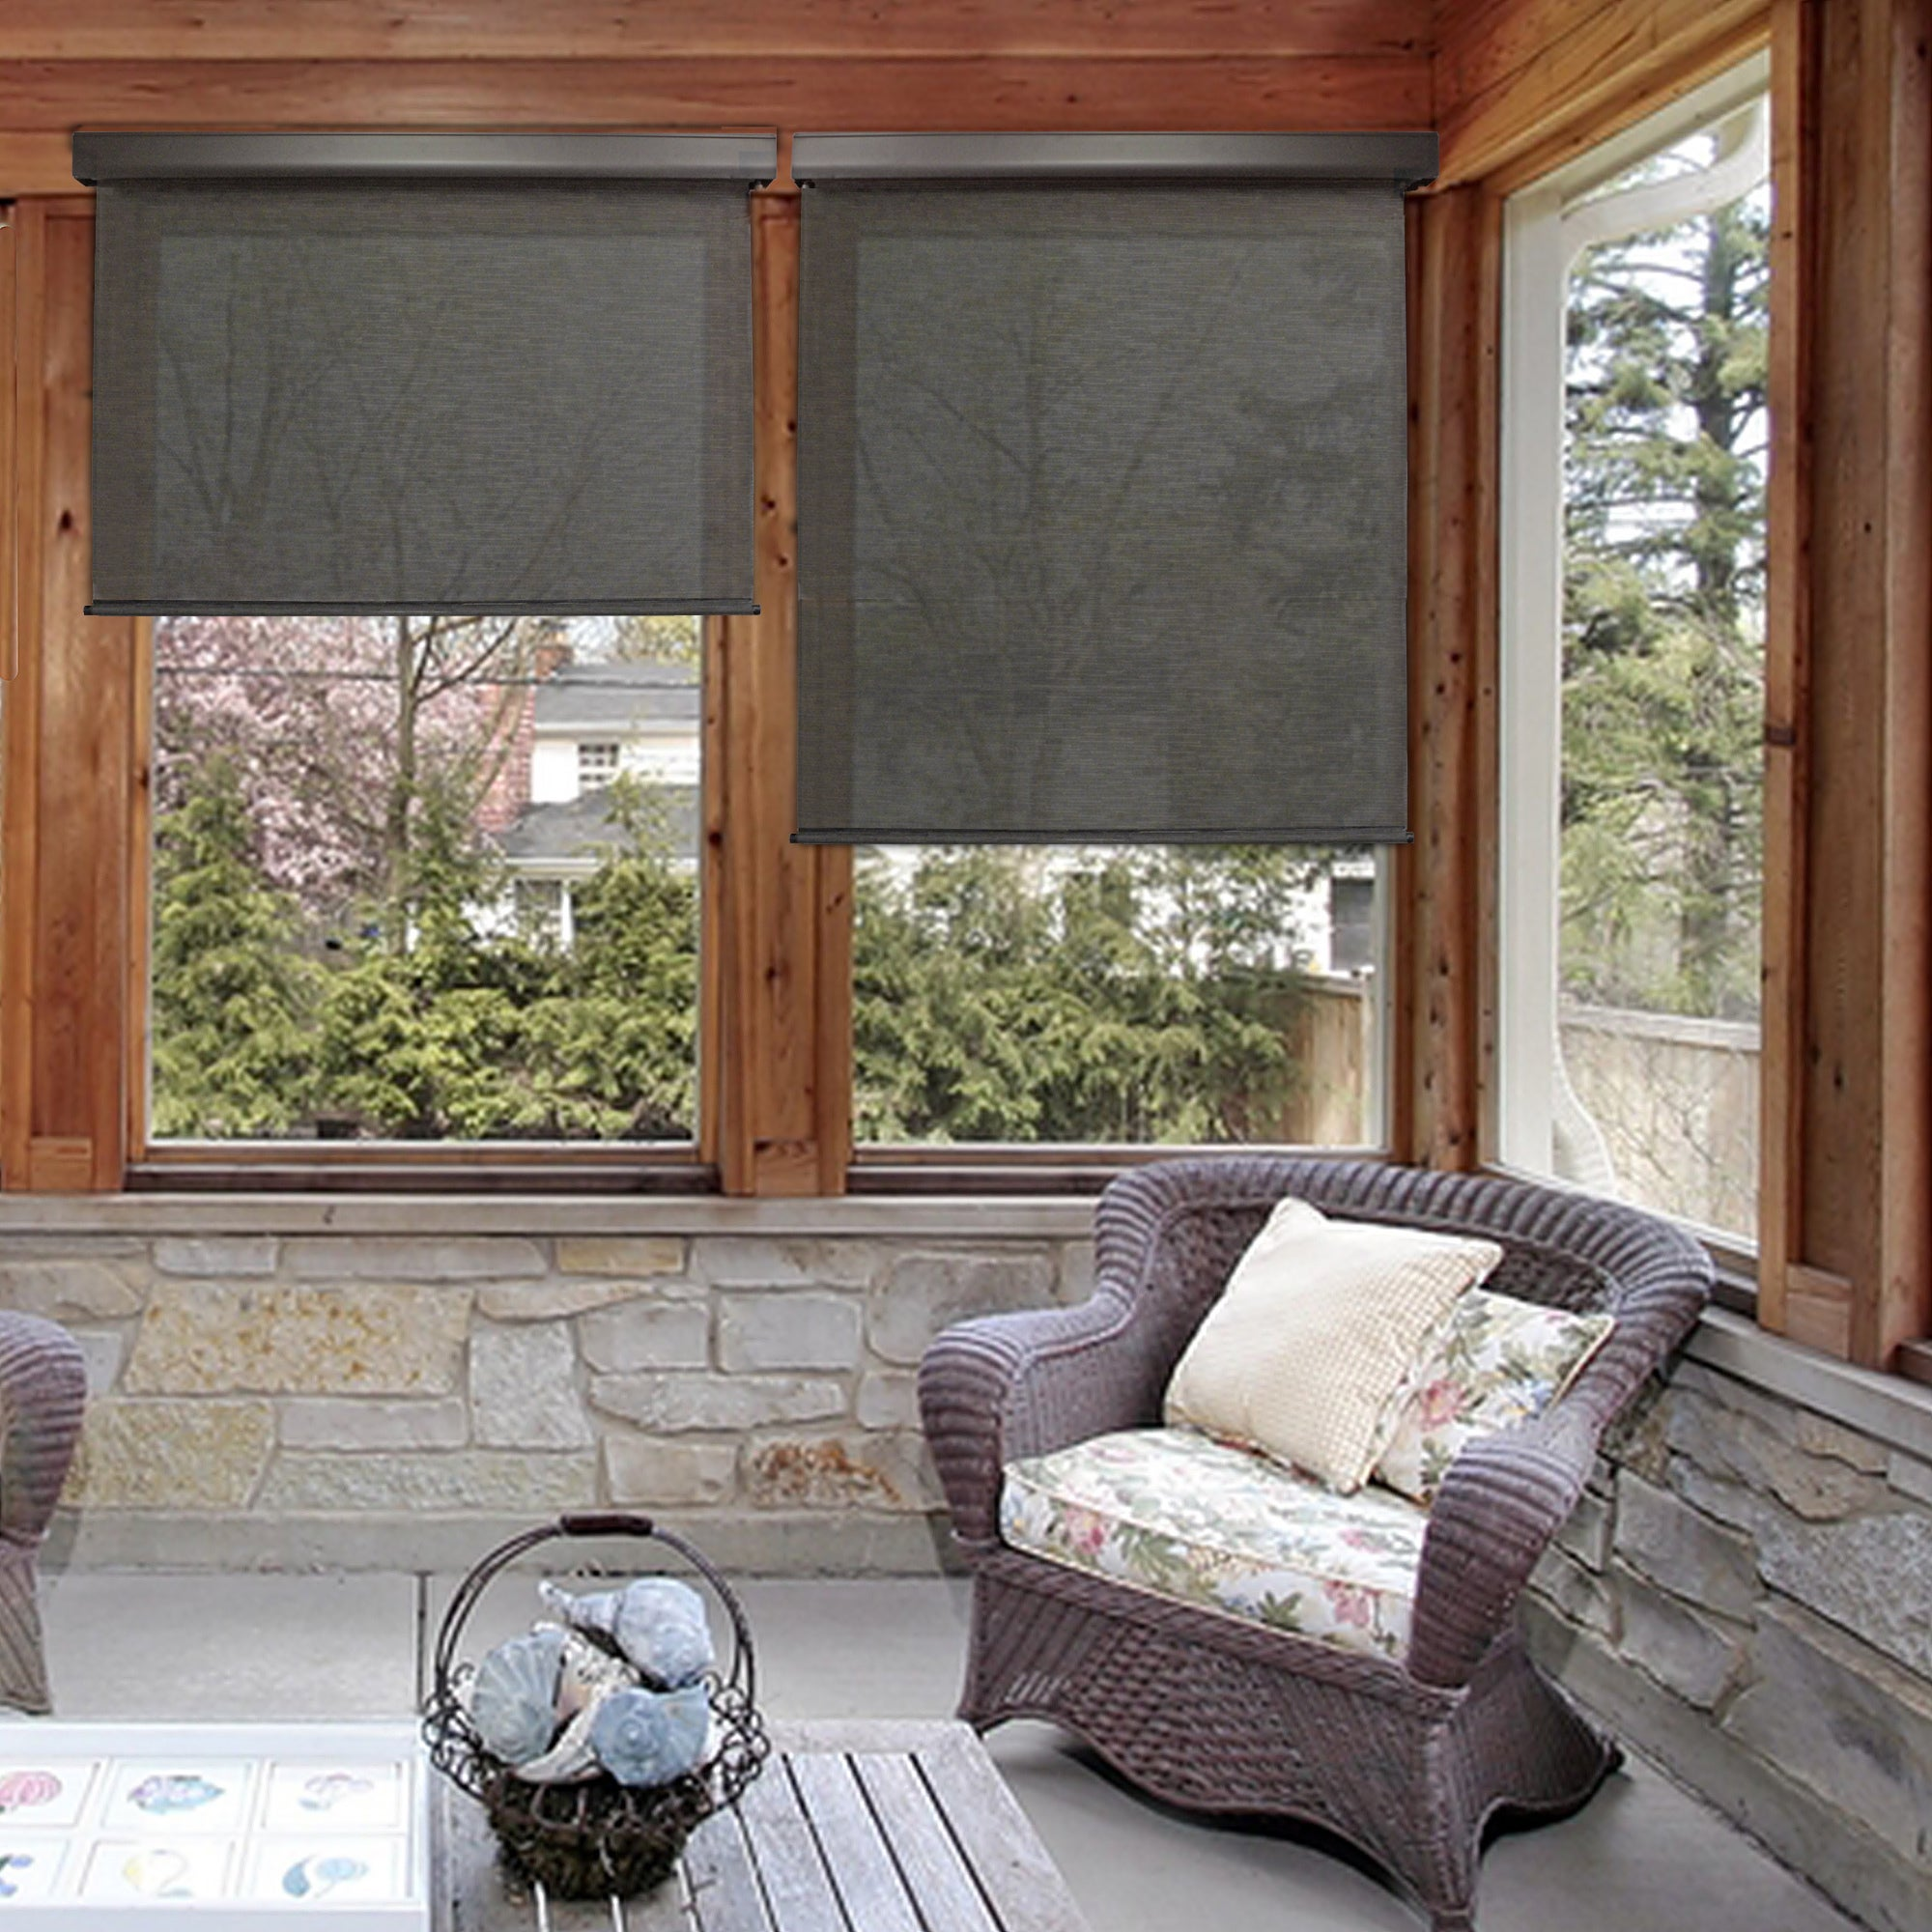 buy blinds custom window automated affordable venetian pvc curtains web wellington made